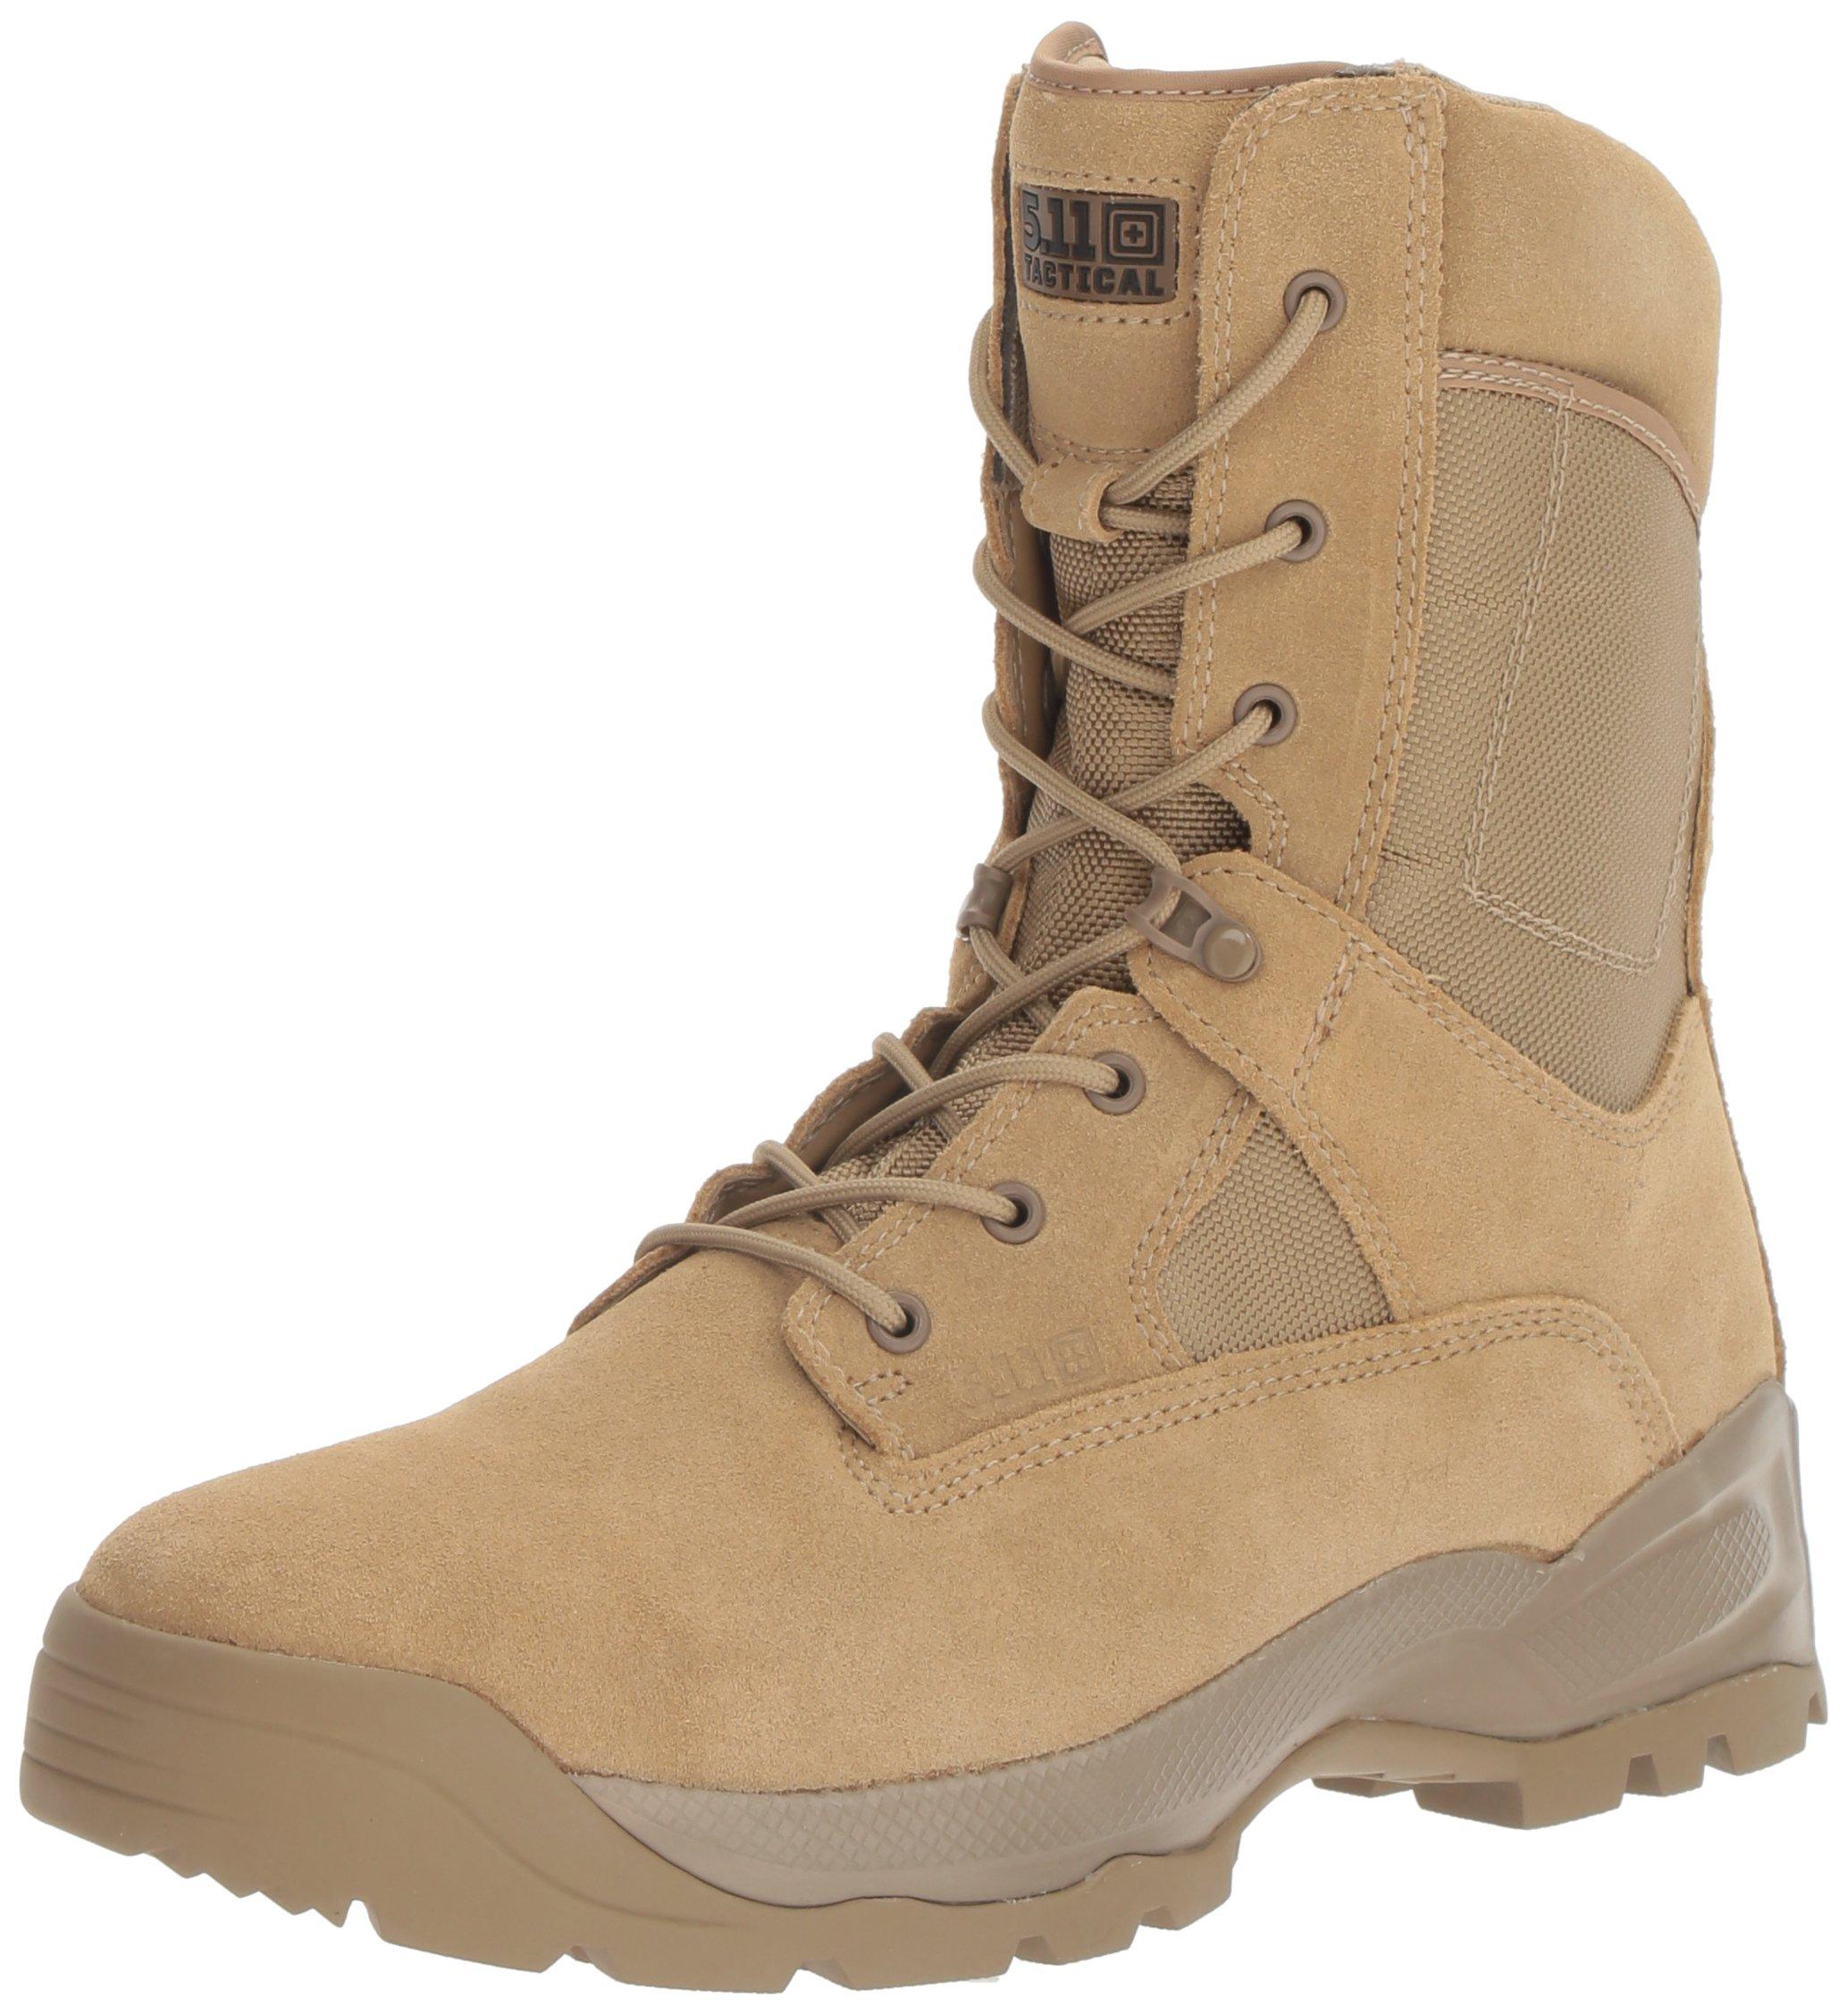 5.11 Men's ATAC 8In Boot-U, Coyote Brown, 11 D(M) US by 5.11